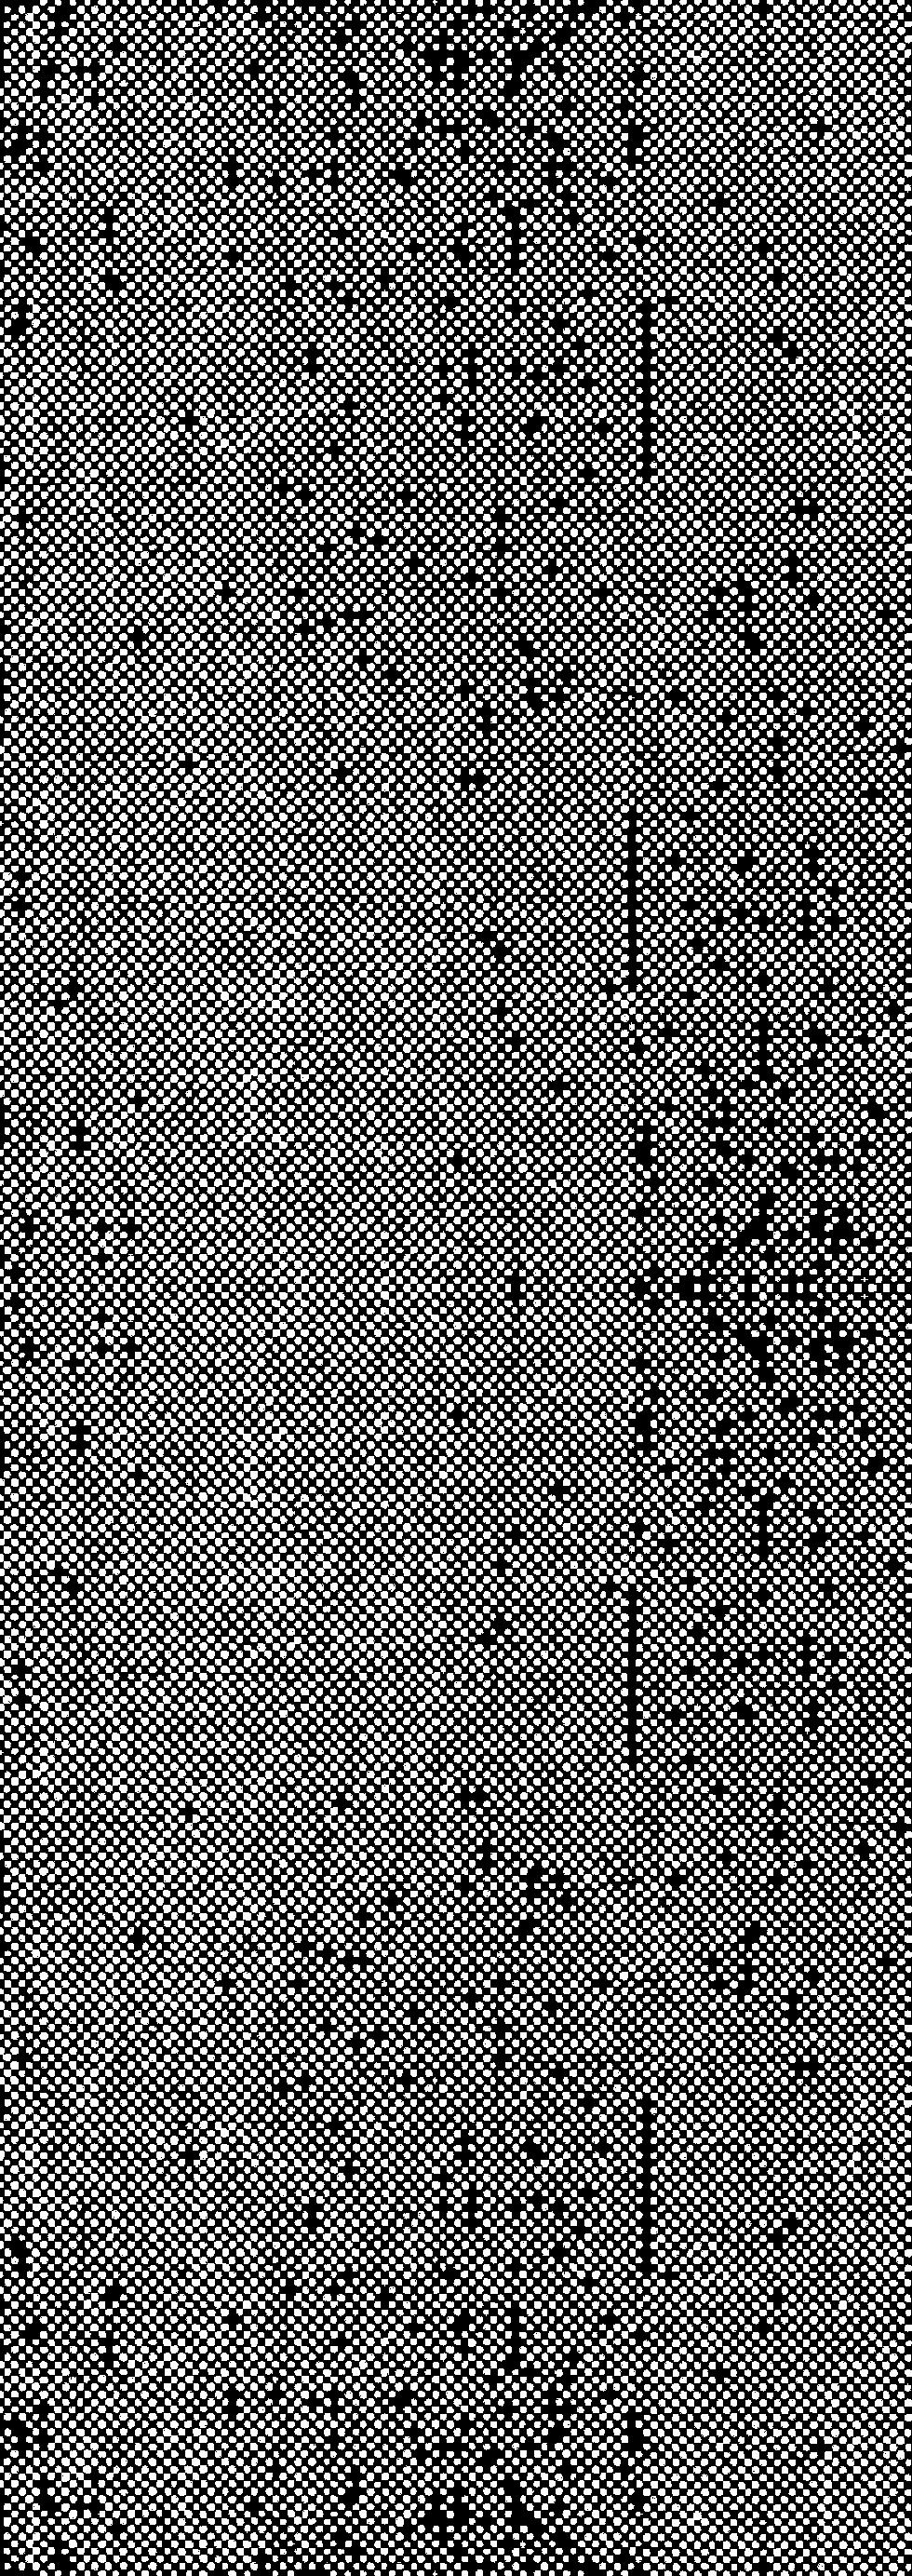 Dot Screen REV.png